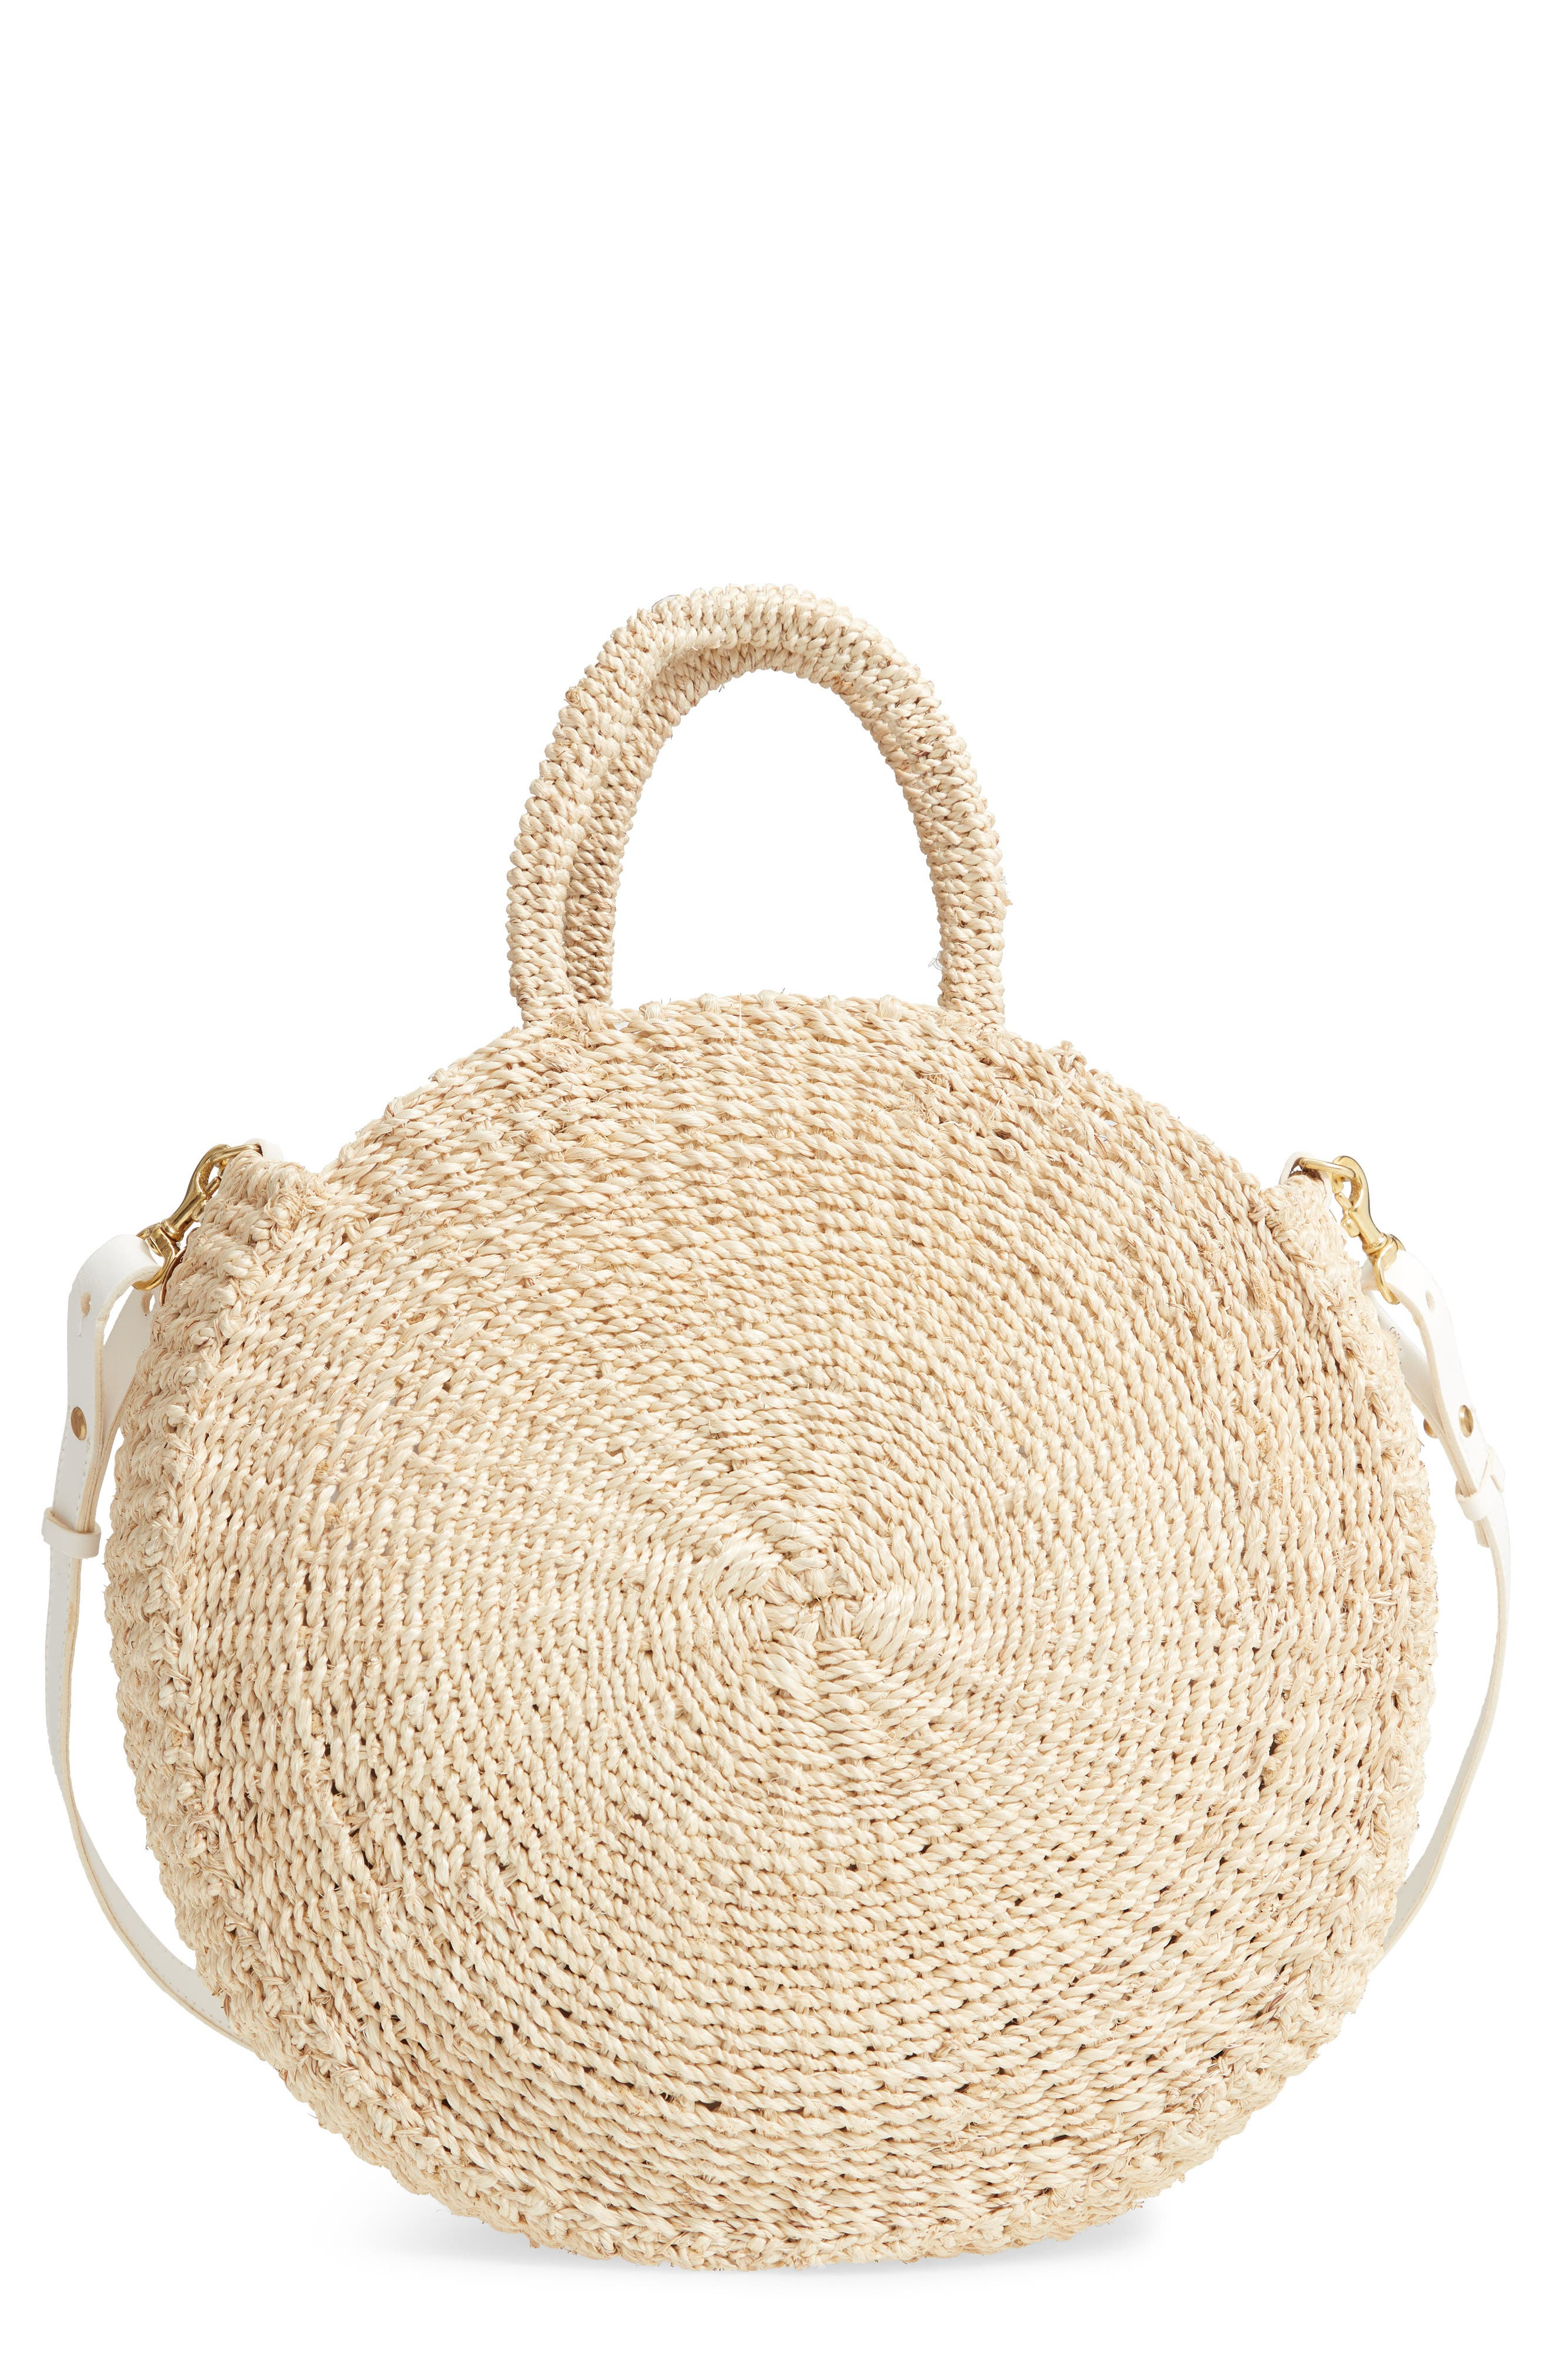 Alice Woven Sisal Straw Bag,                         Main,                         color, Natural